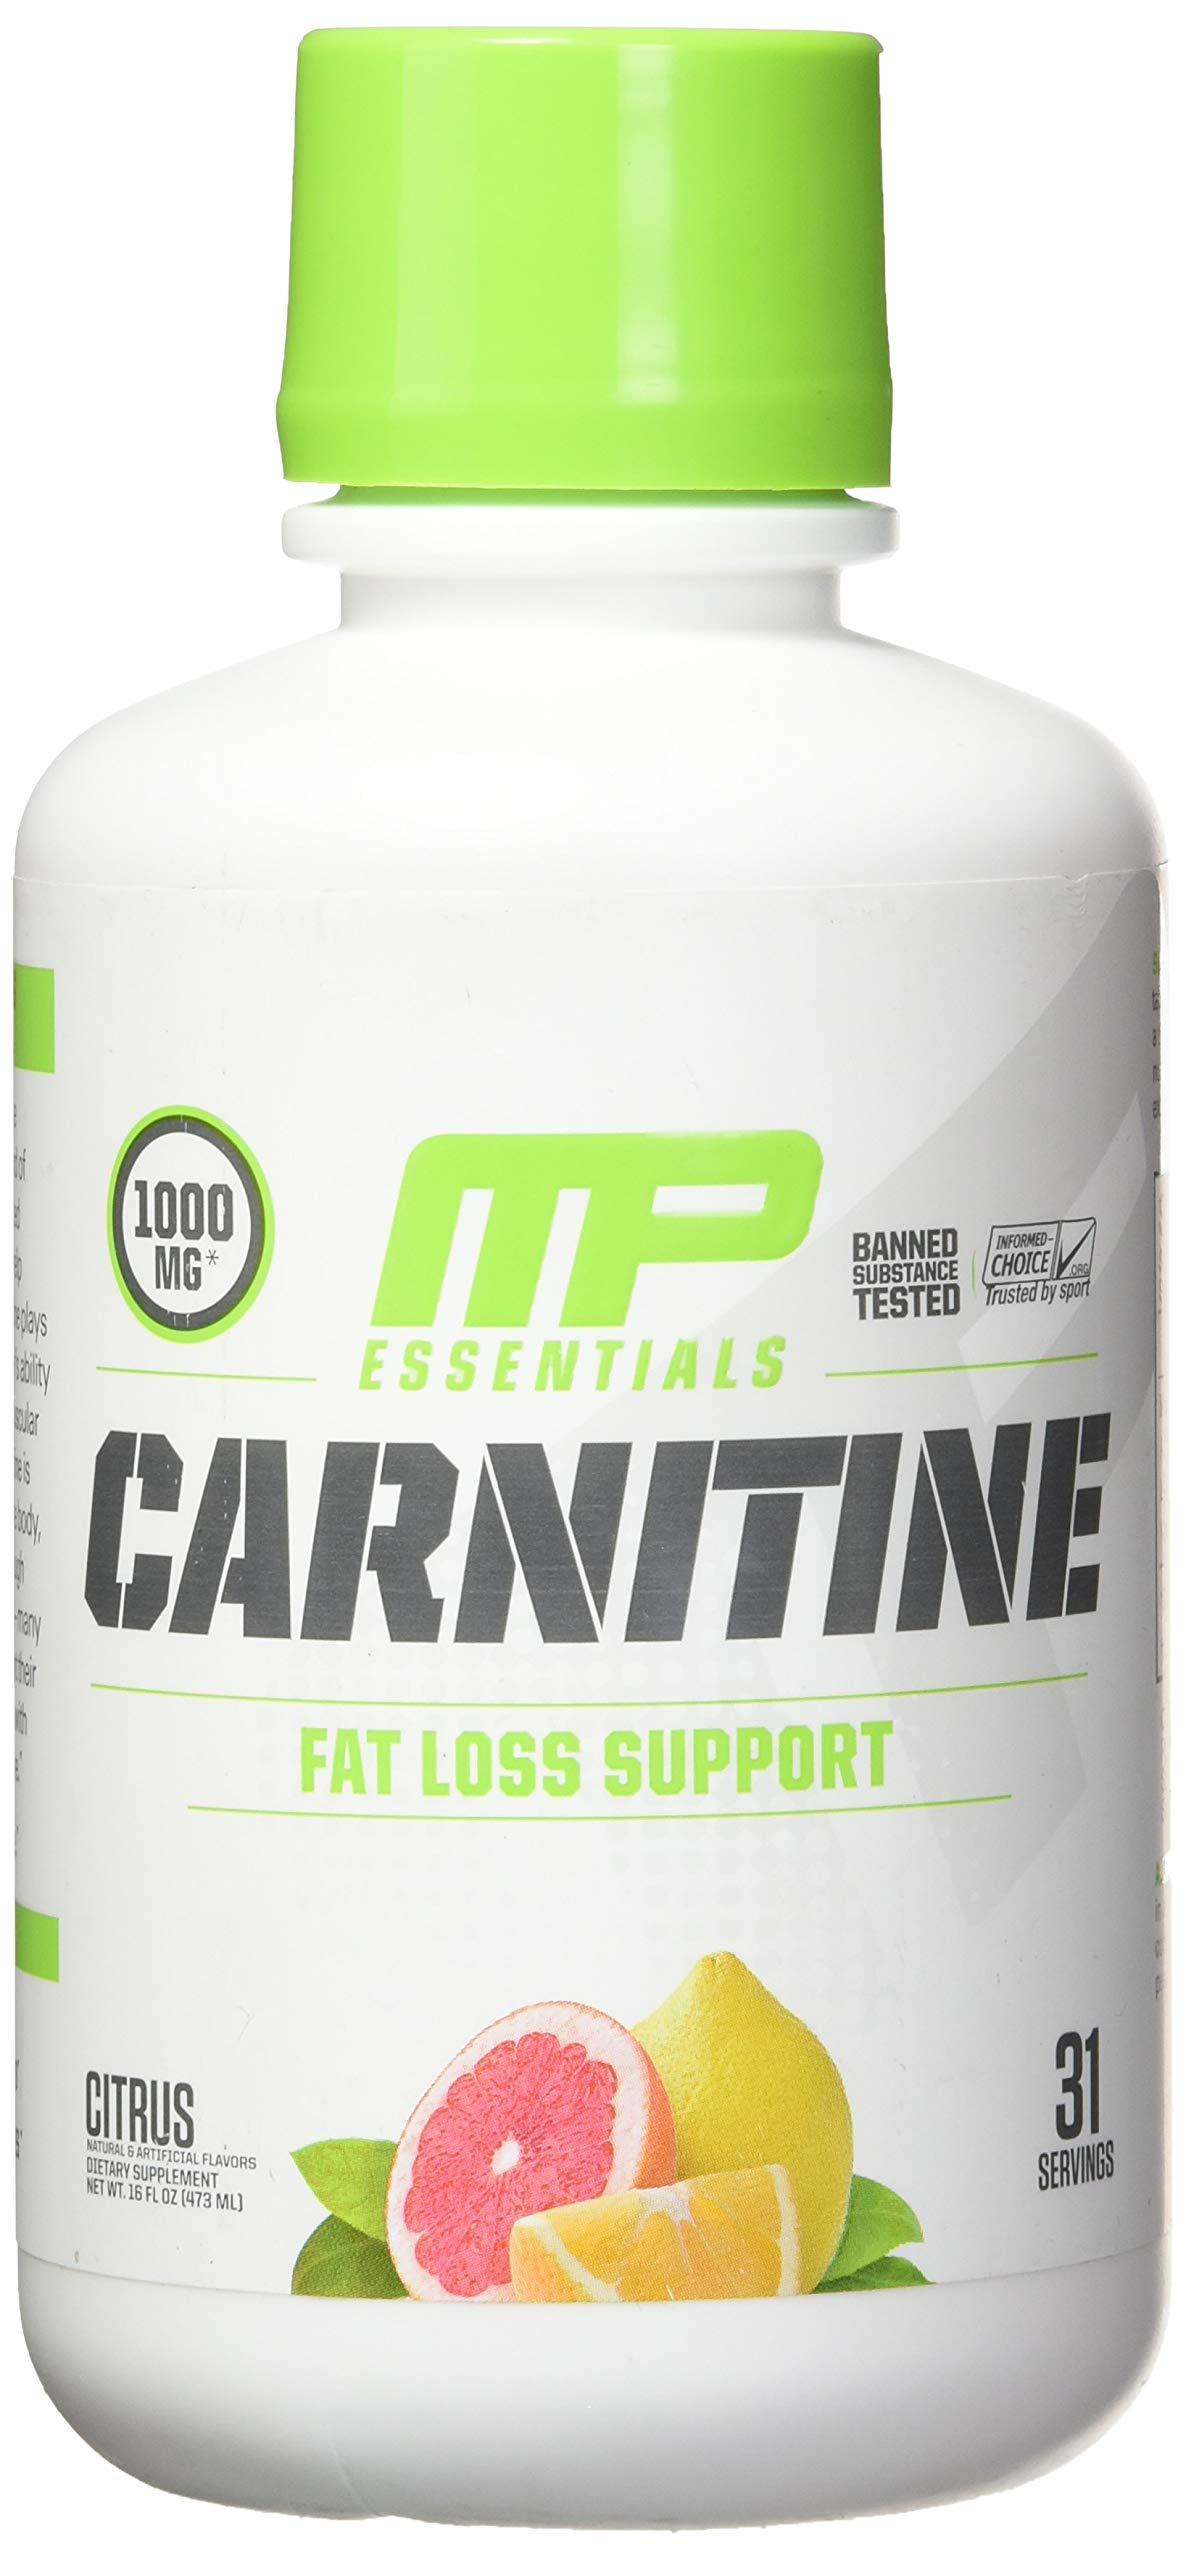 MusclePharm Essentials Carnitine Liquid, 1000mg Carnitine Blend, Citrus, 31 Servings